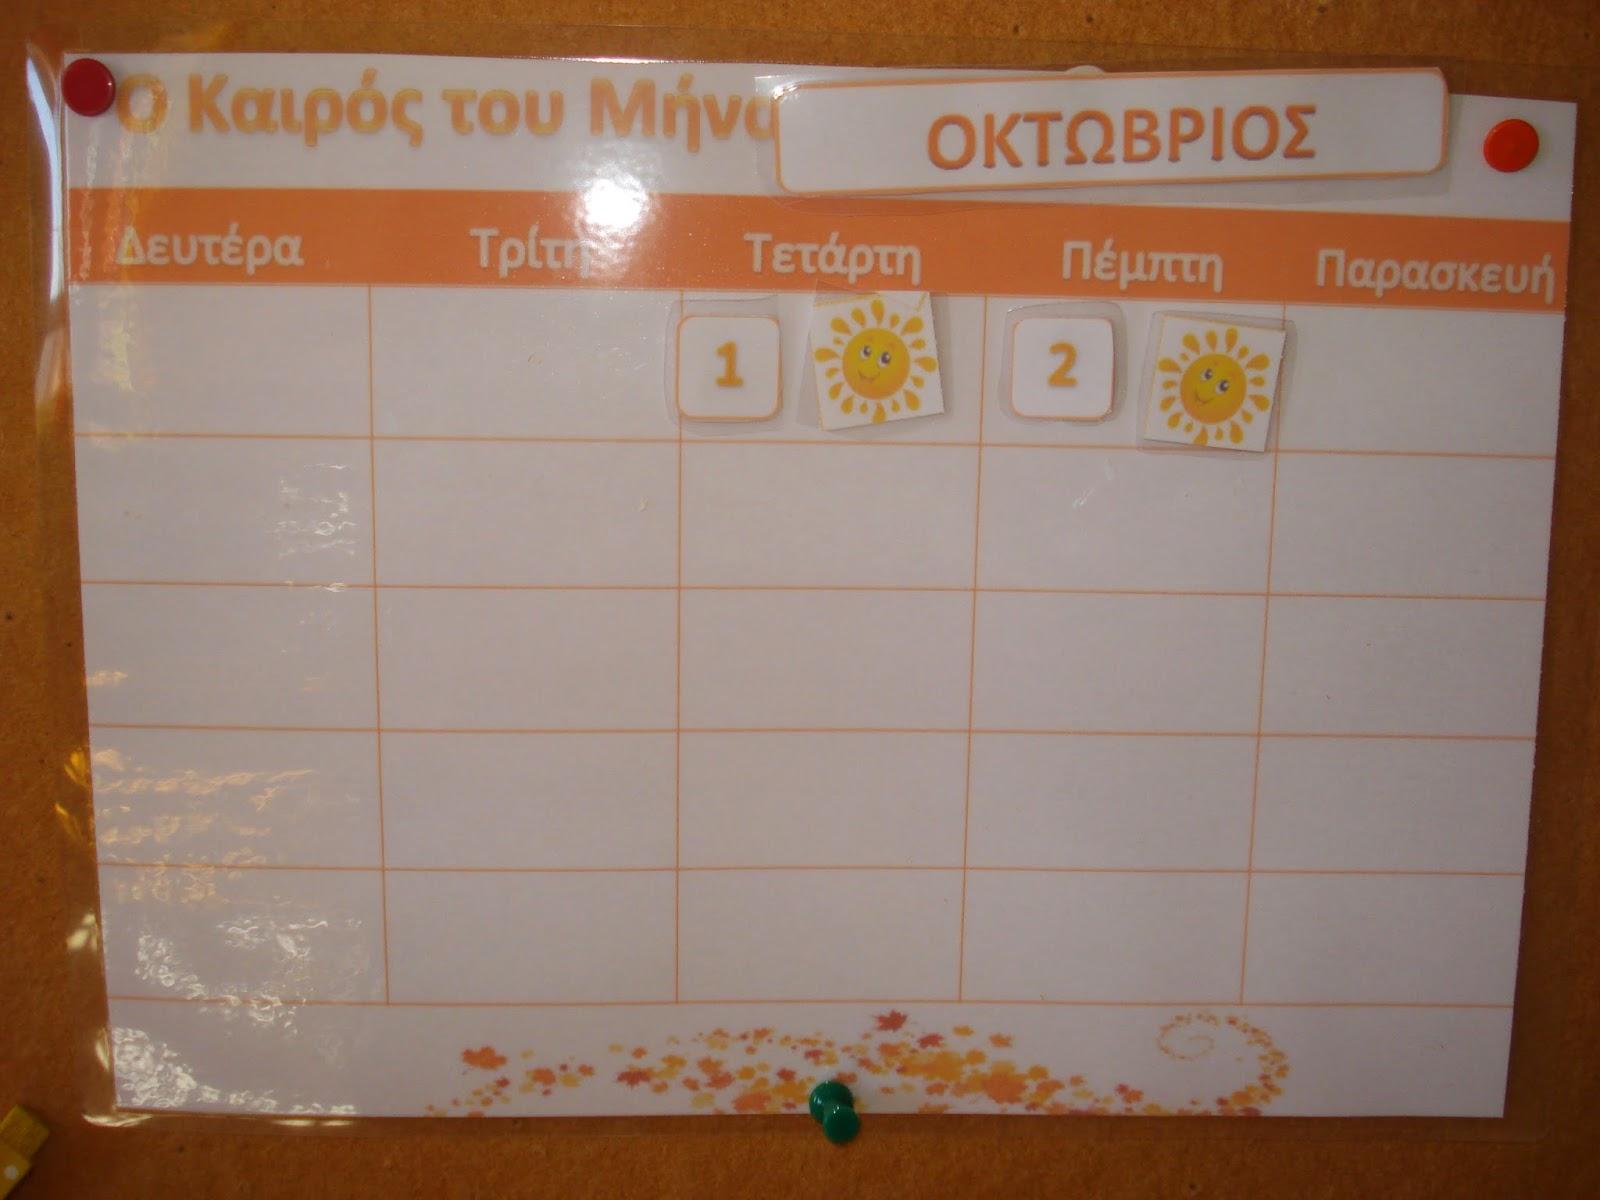 http://nipiagogeiovlahaton.blogspot.gr/2014/10/blog-post.html